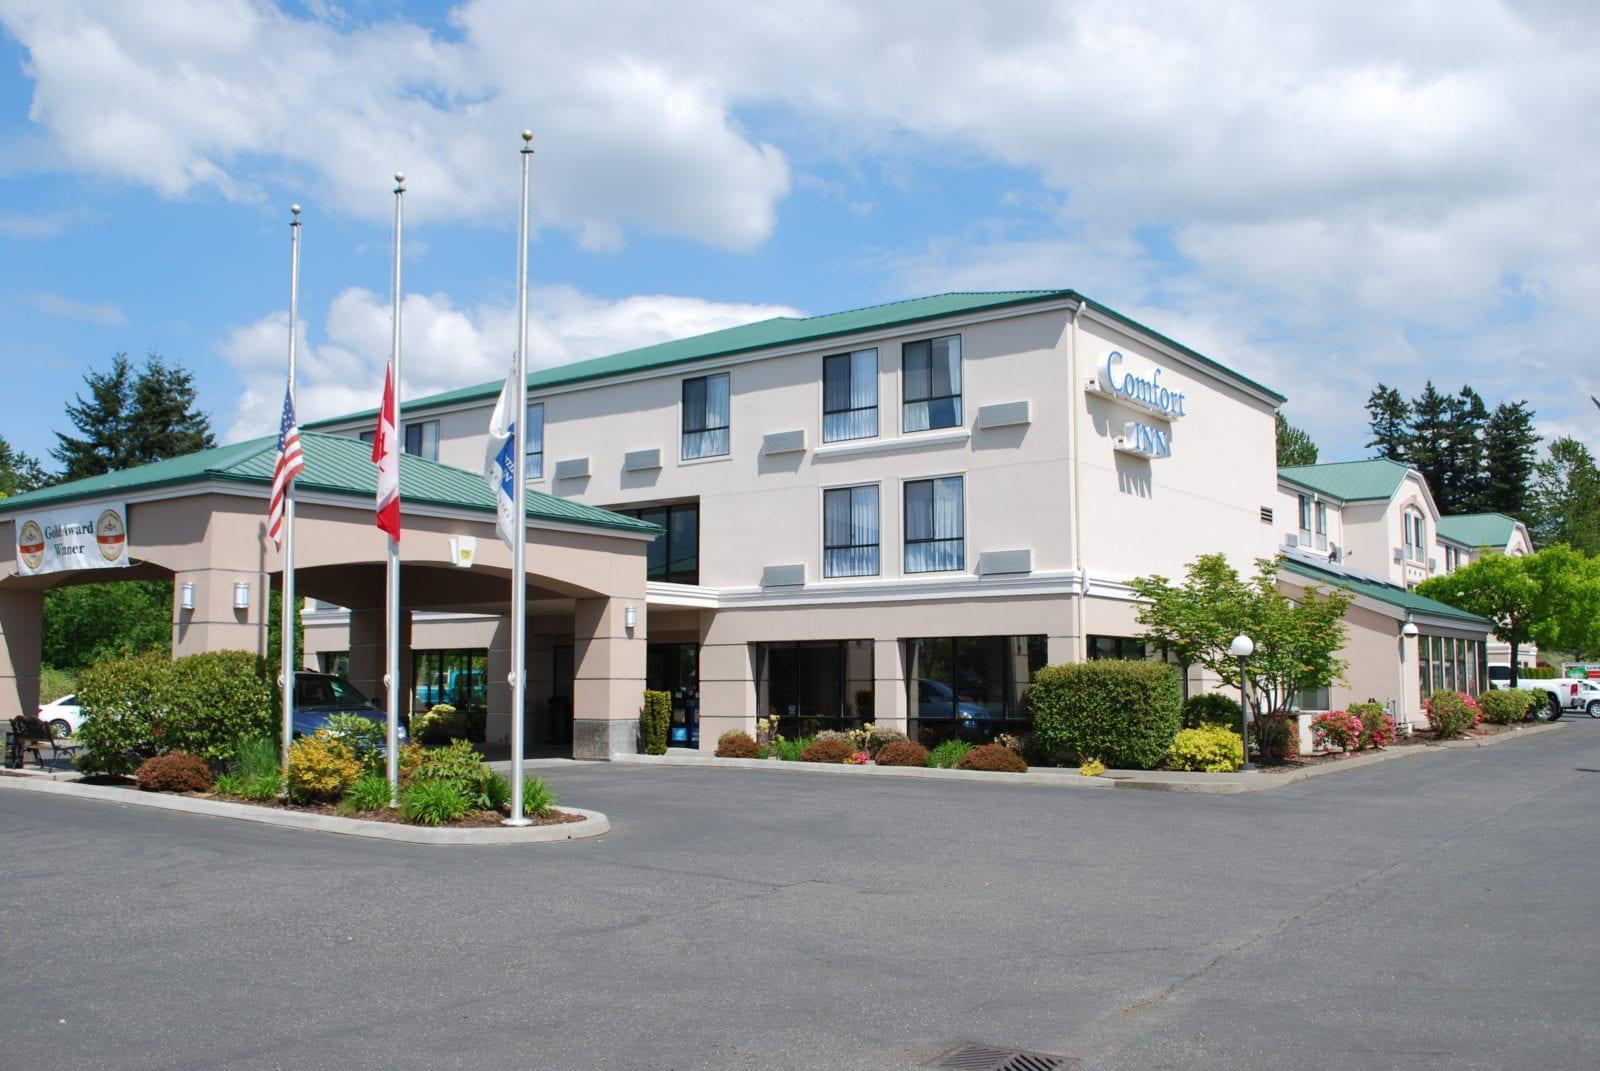 Hotels in Bellingham Comfort Inn